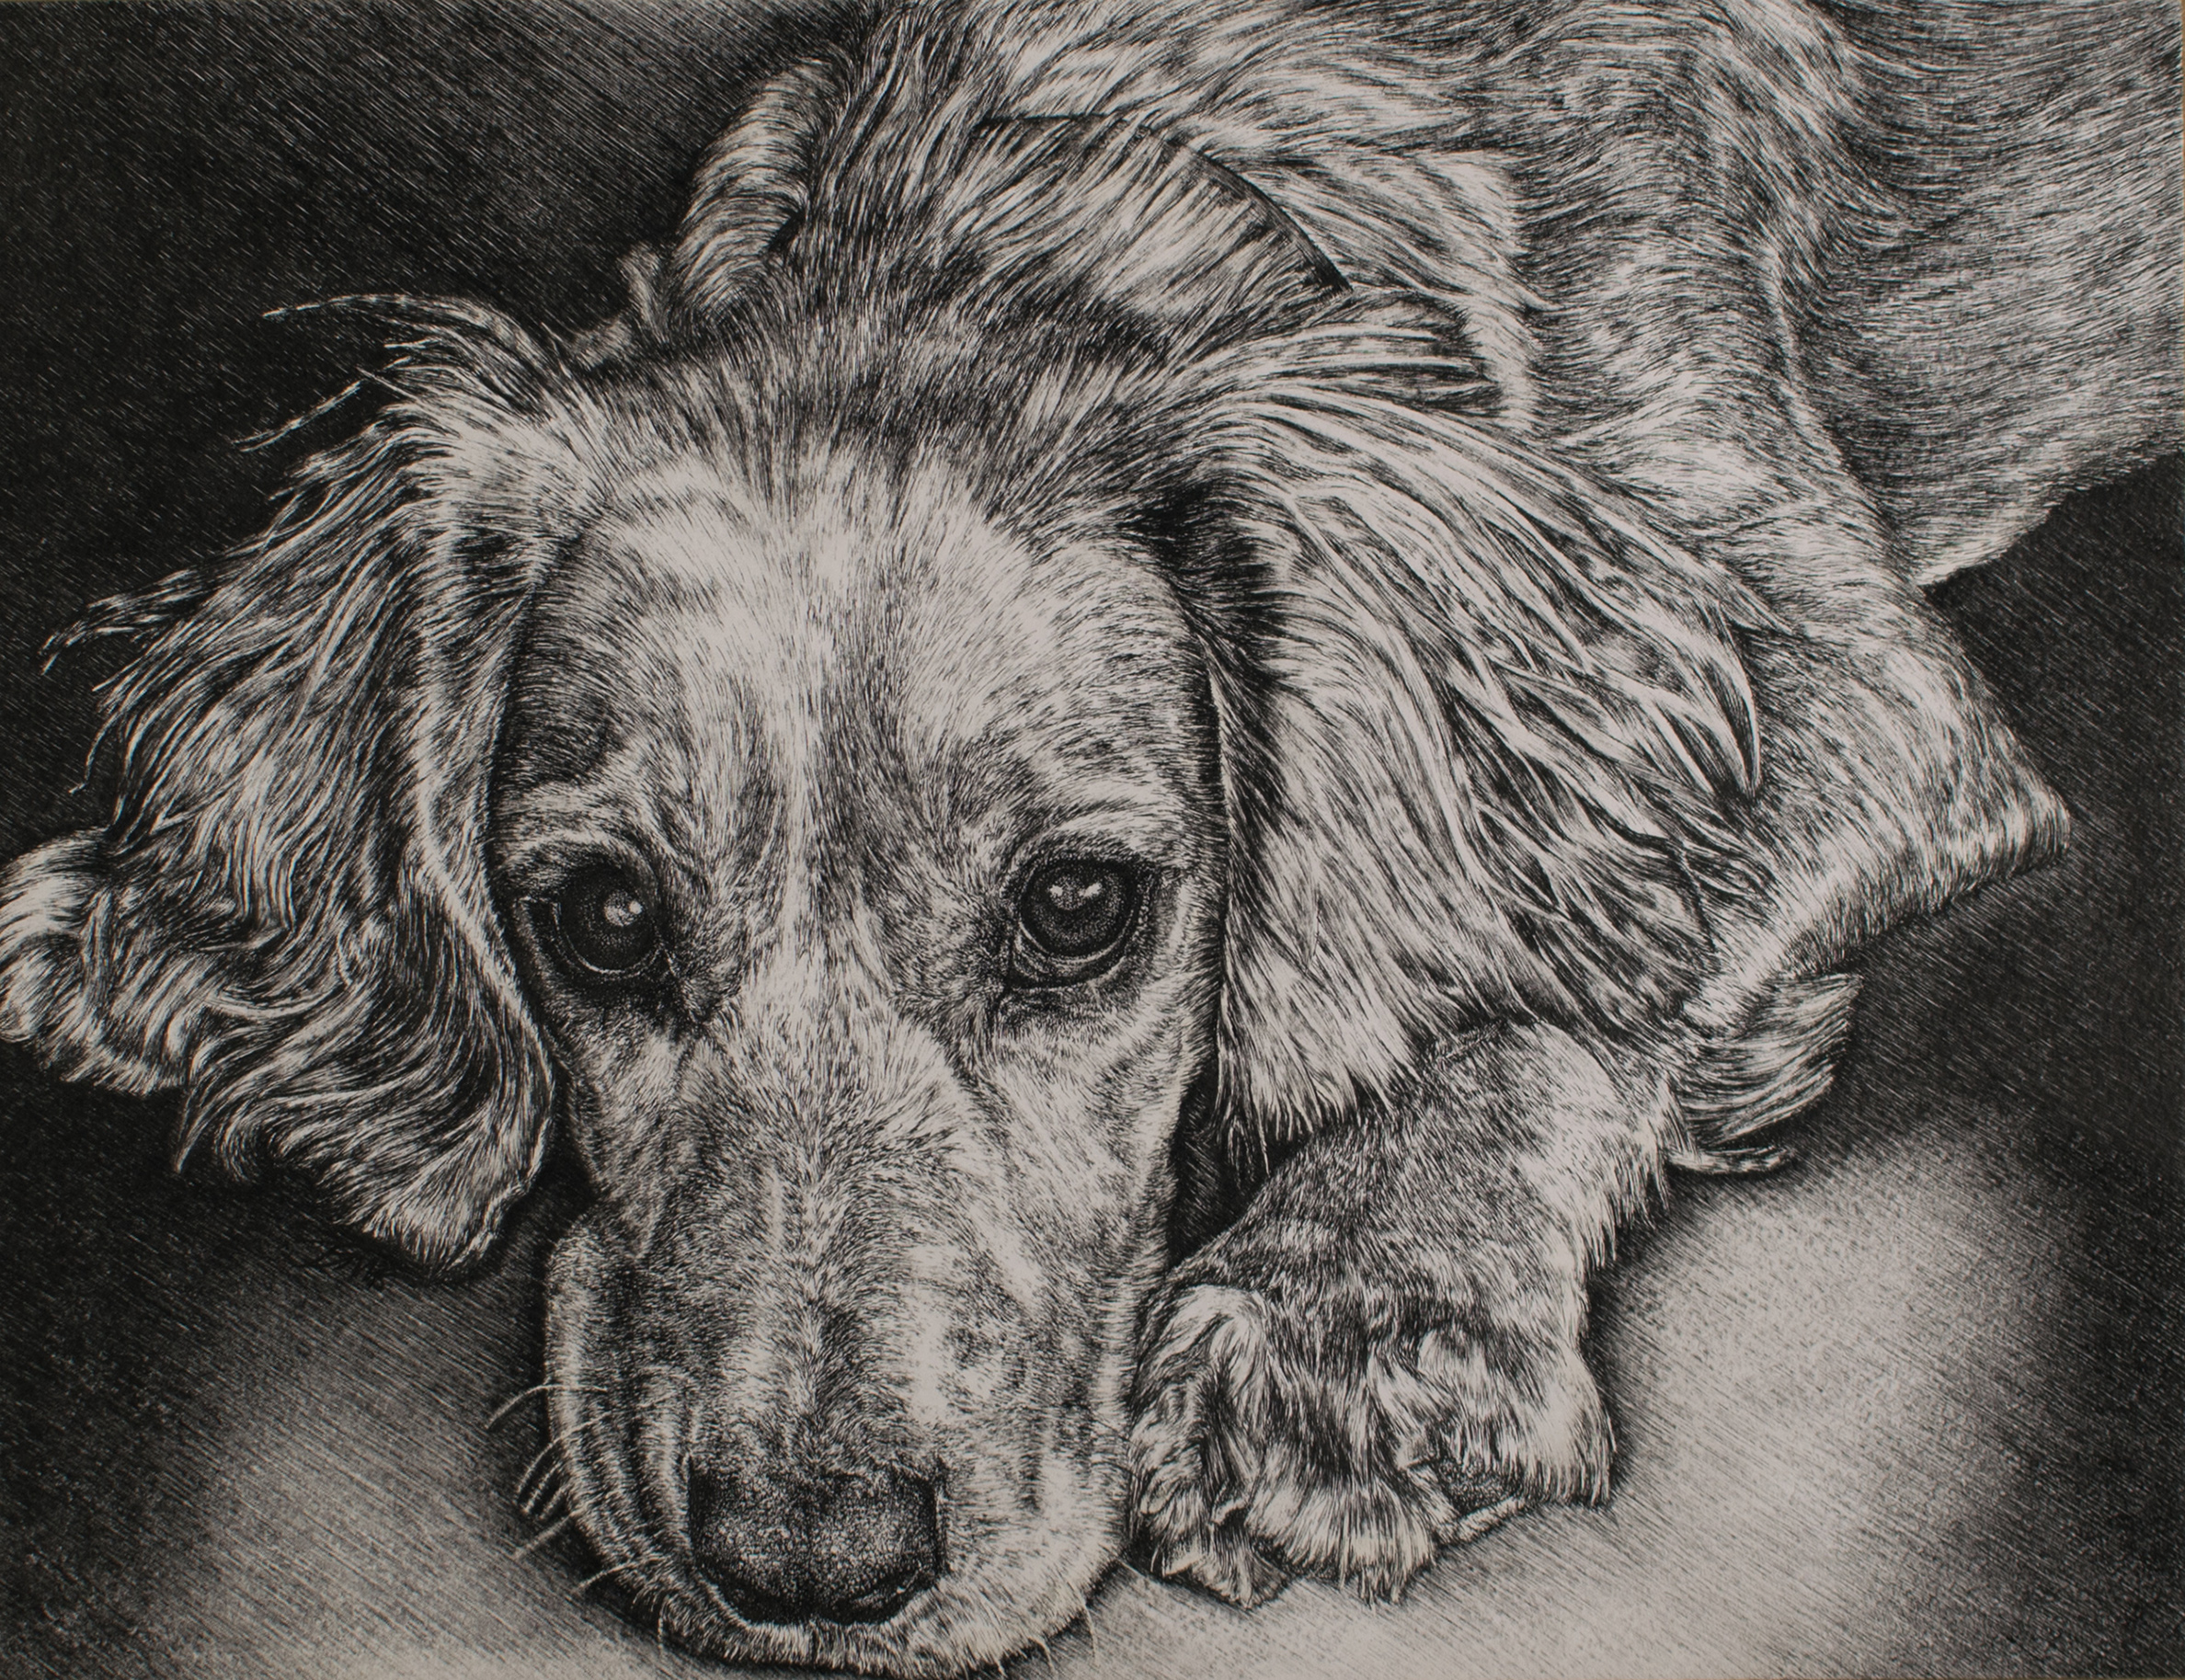 Jane Elizabeth Martin, Harriet 3, Ink on watercolour paper, 30.5cm x 40cm x 0.2cm,  http://www.janeelizabethmartin.com